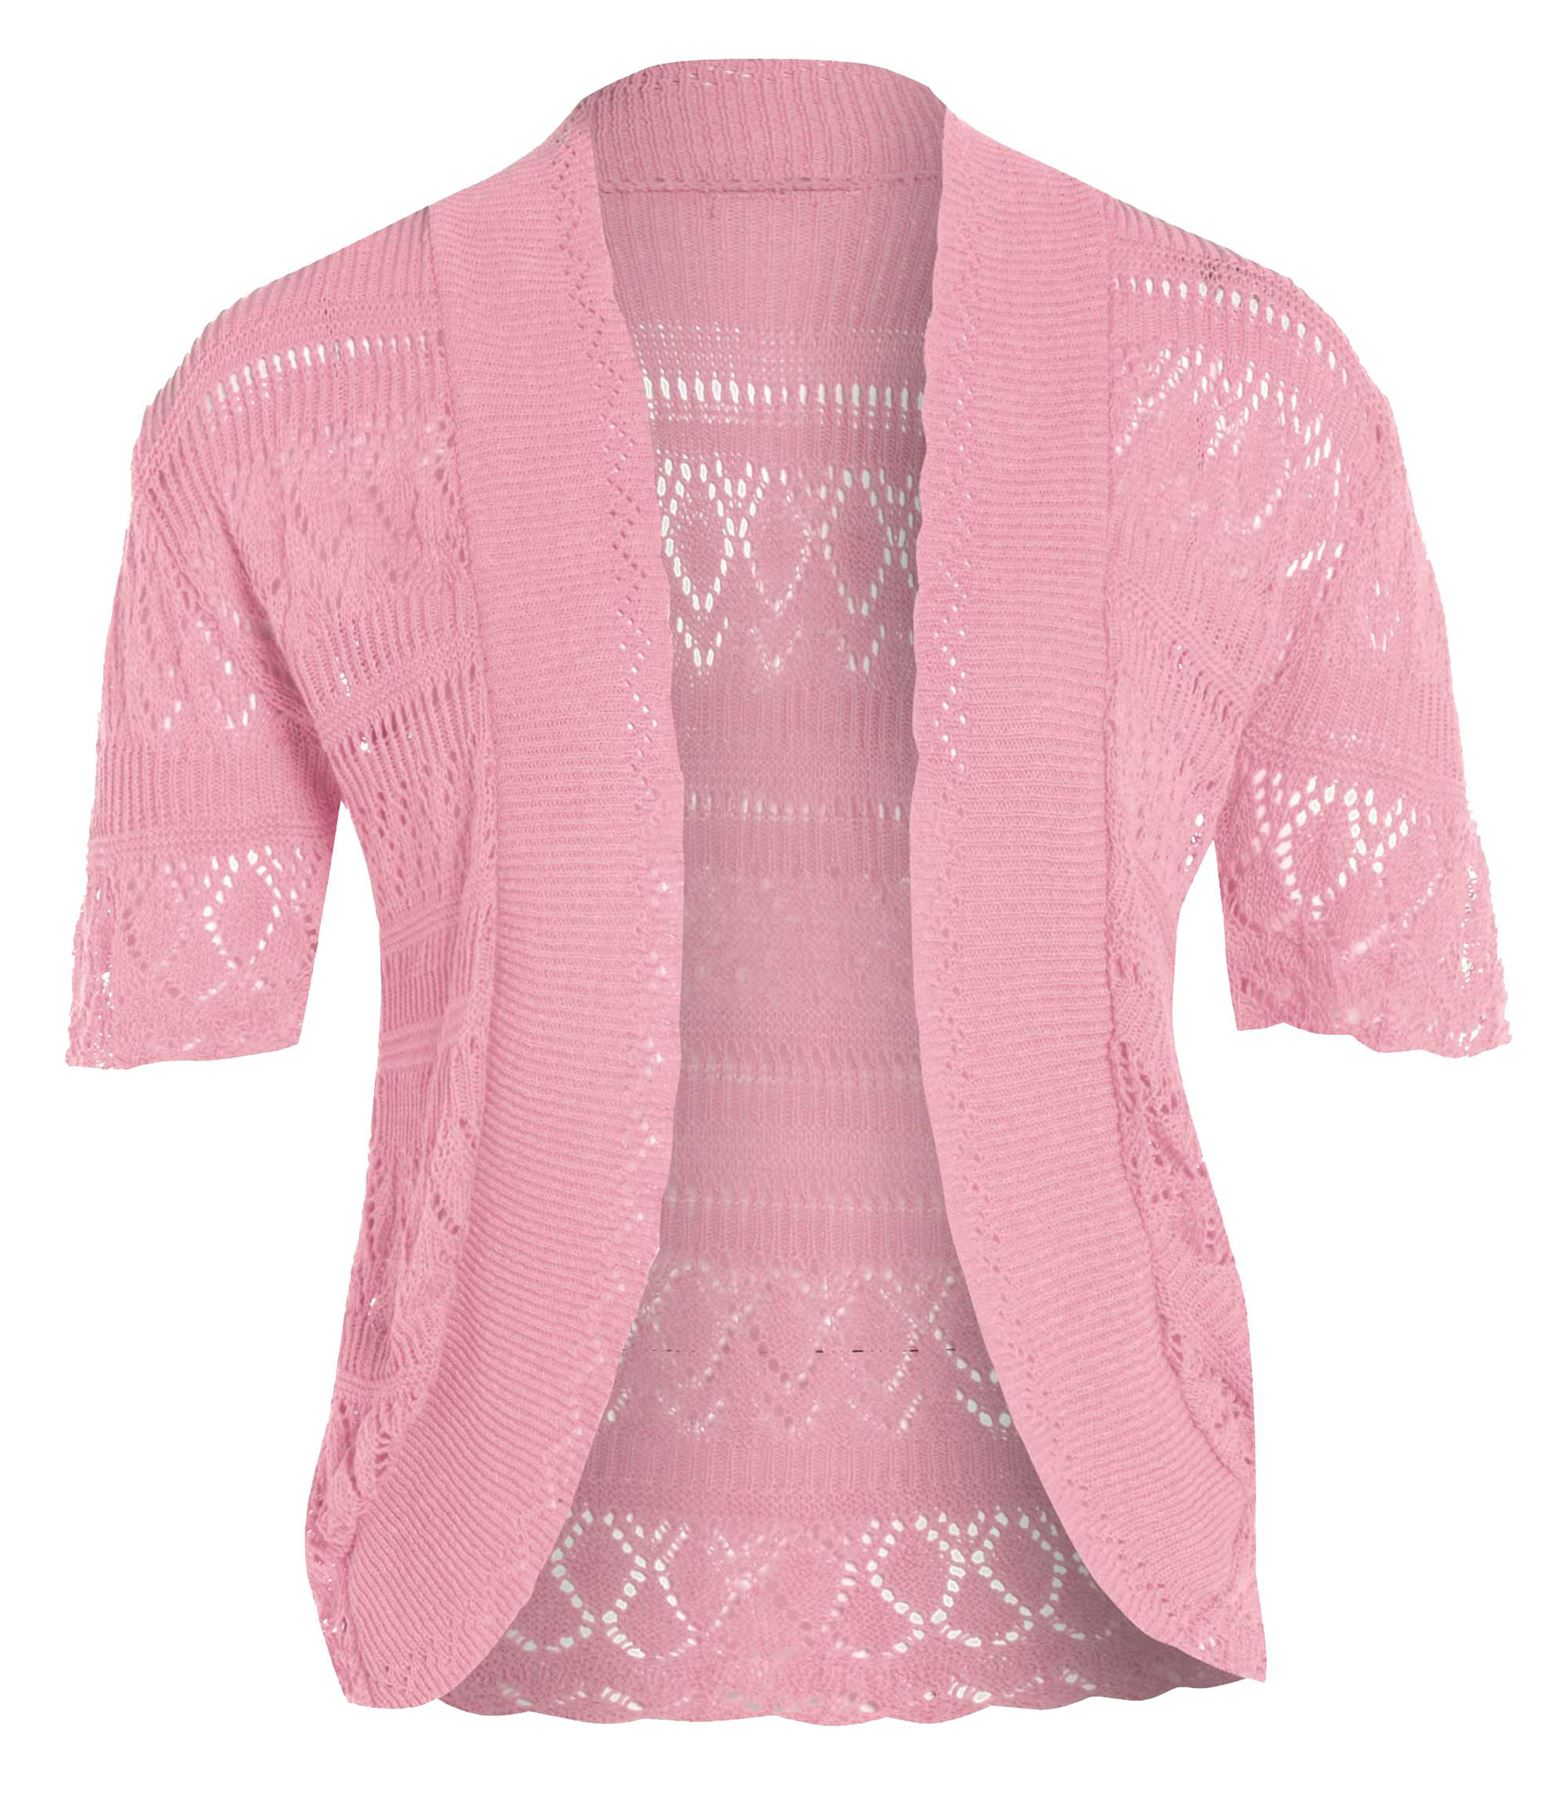 neue damen gestrickte bolero crochet pullover tops 44 54